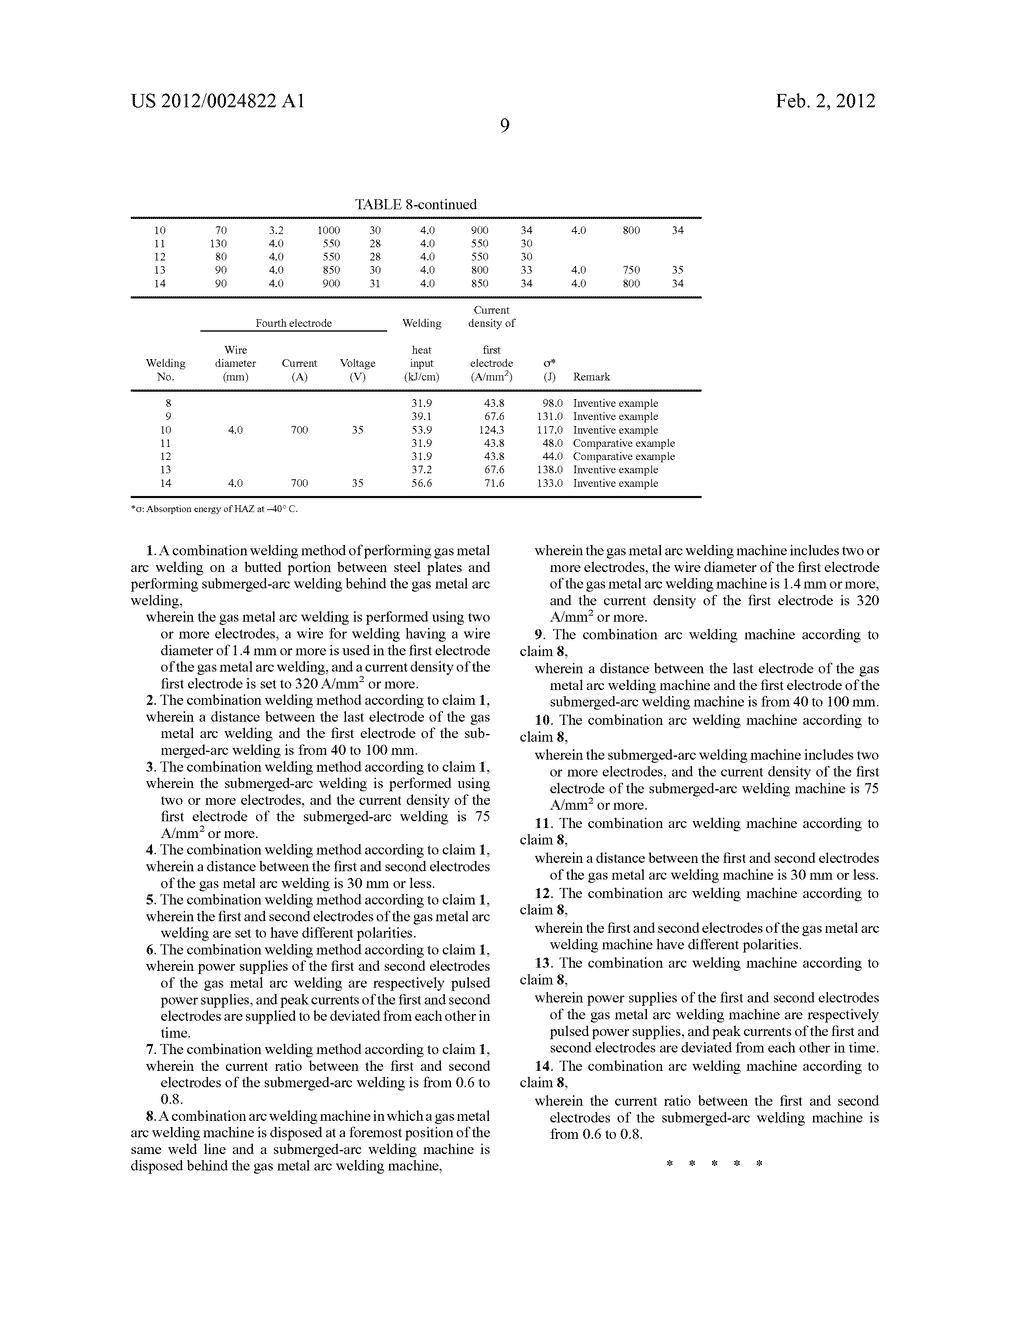 hight resolution of combination welding method using combination of gas metal arc welding and submerged arc welding and combination arc welding machine diagram schematic